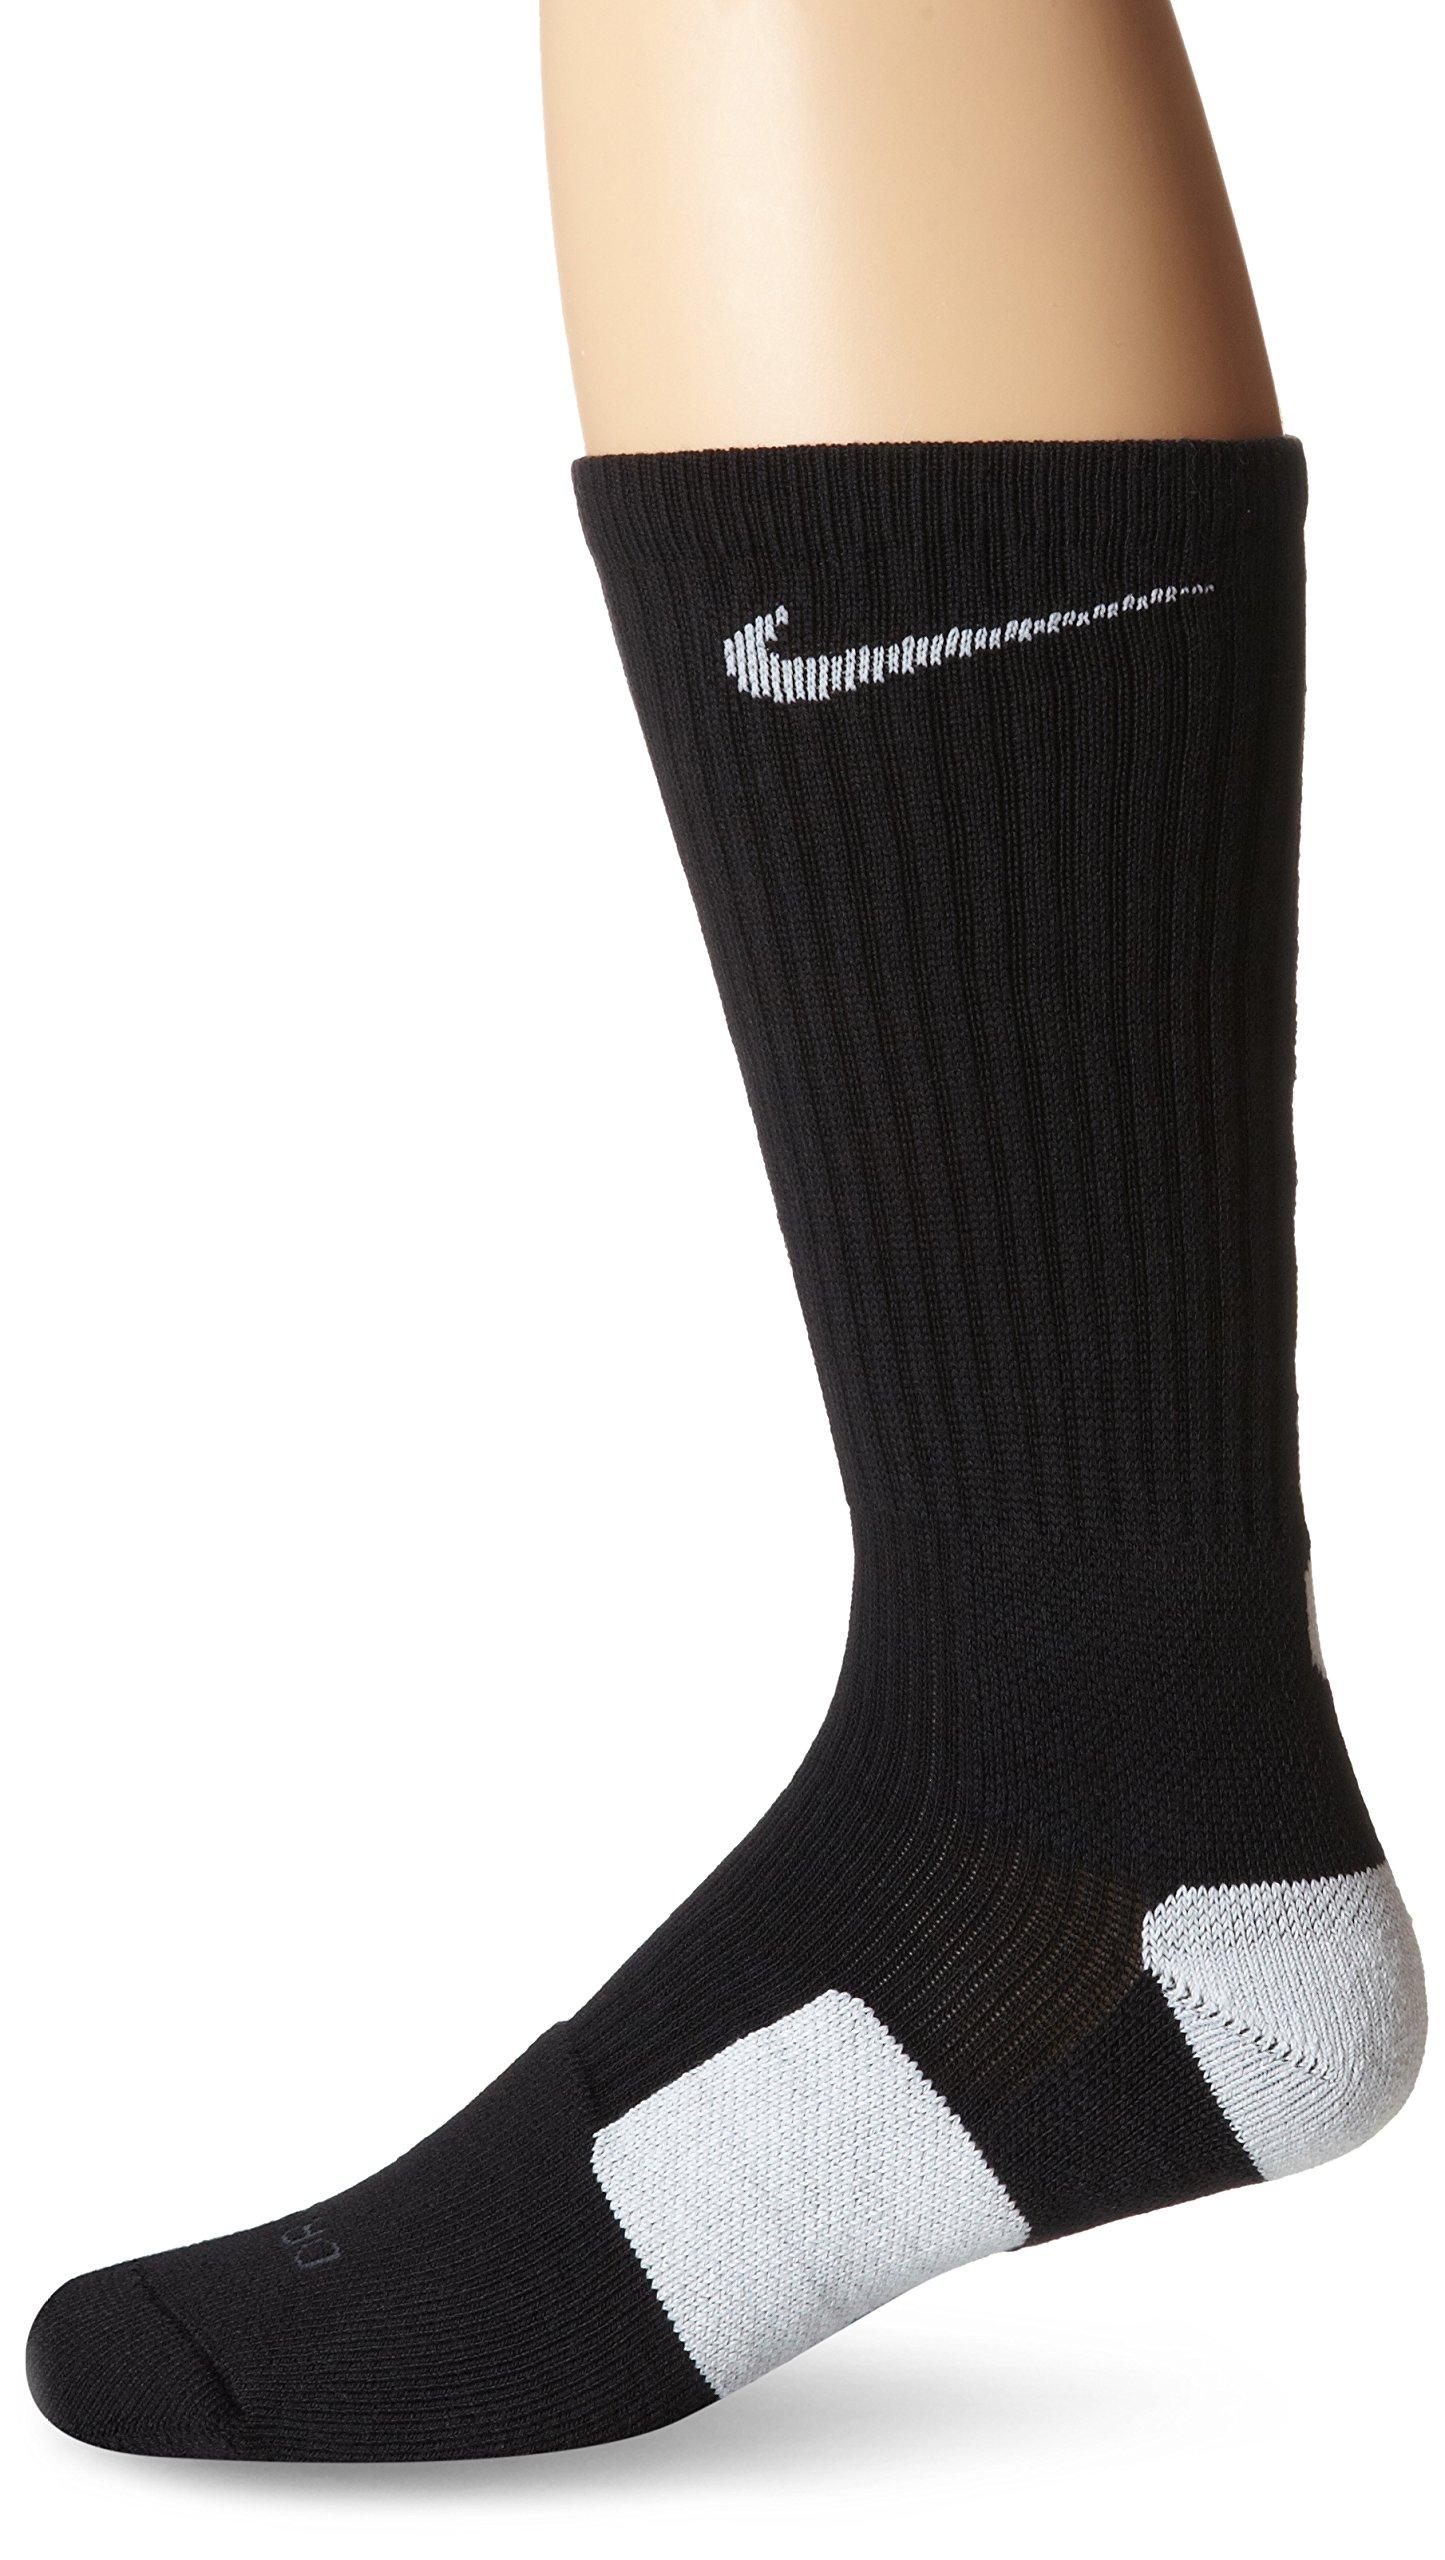 a315a8bf7 Galleon - Nike Mens Elite Cushioned Crew Socks Large (shoe Size 8-12)  (Black)